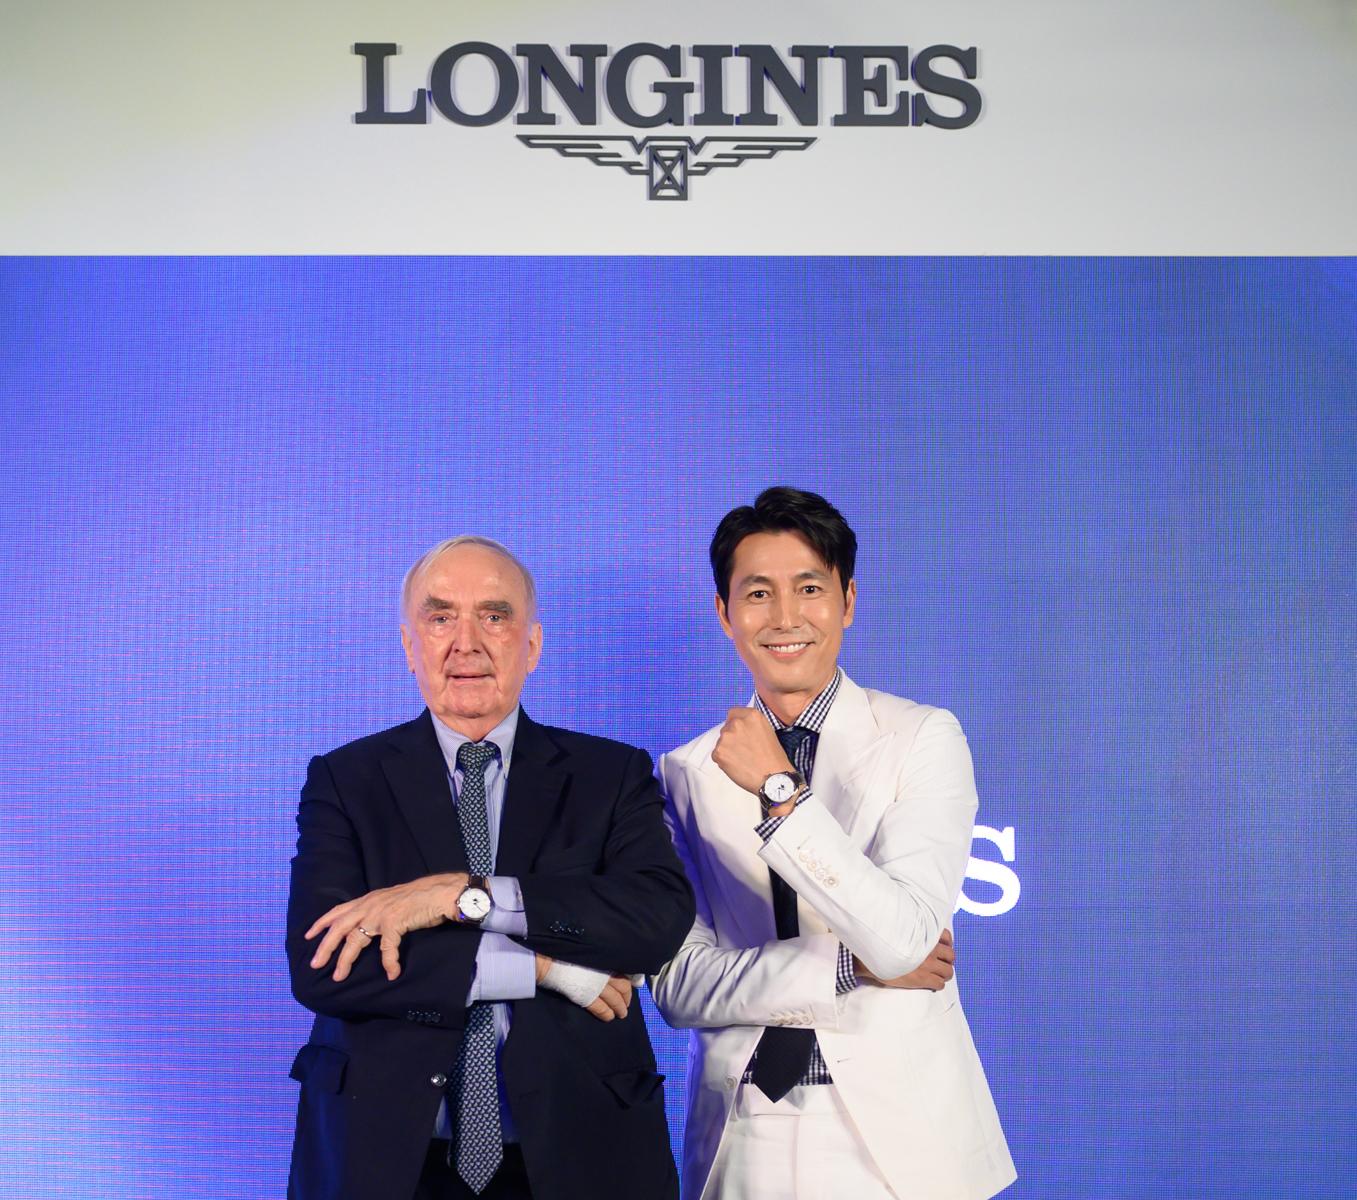 男神演繹全新 Longines 浪琴表「Master」巨擘系列